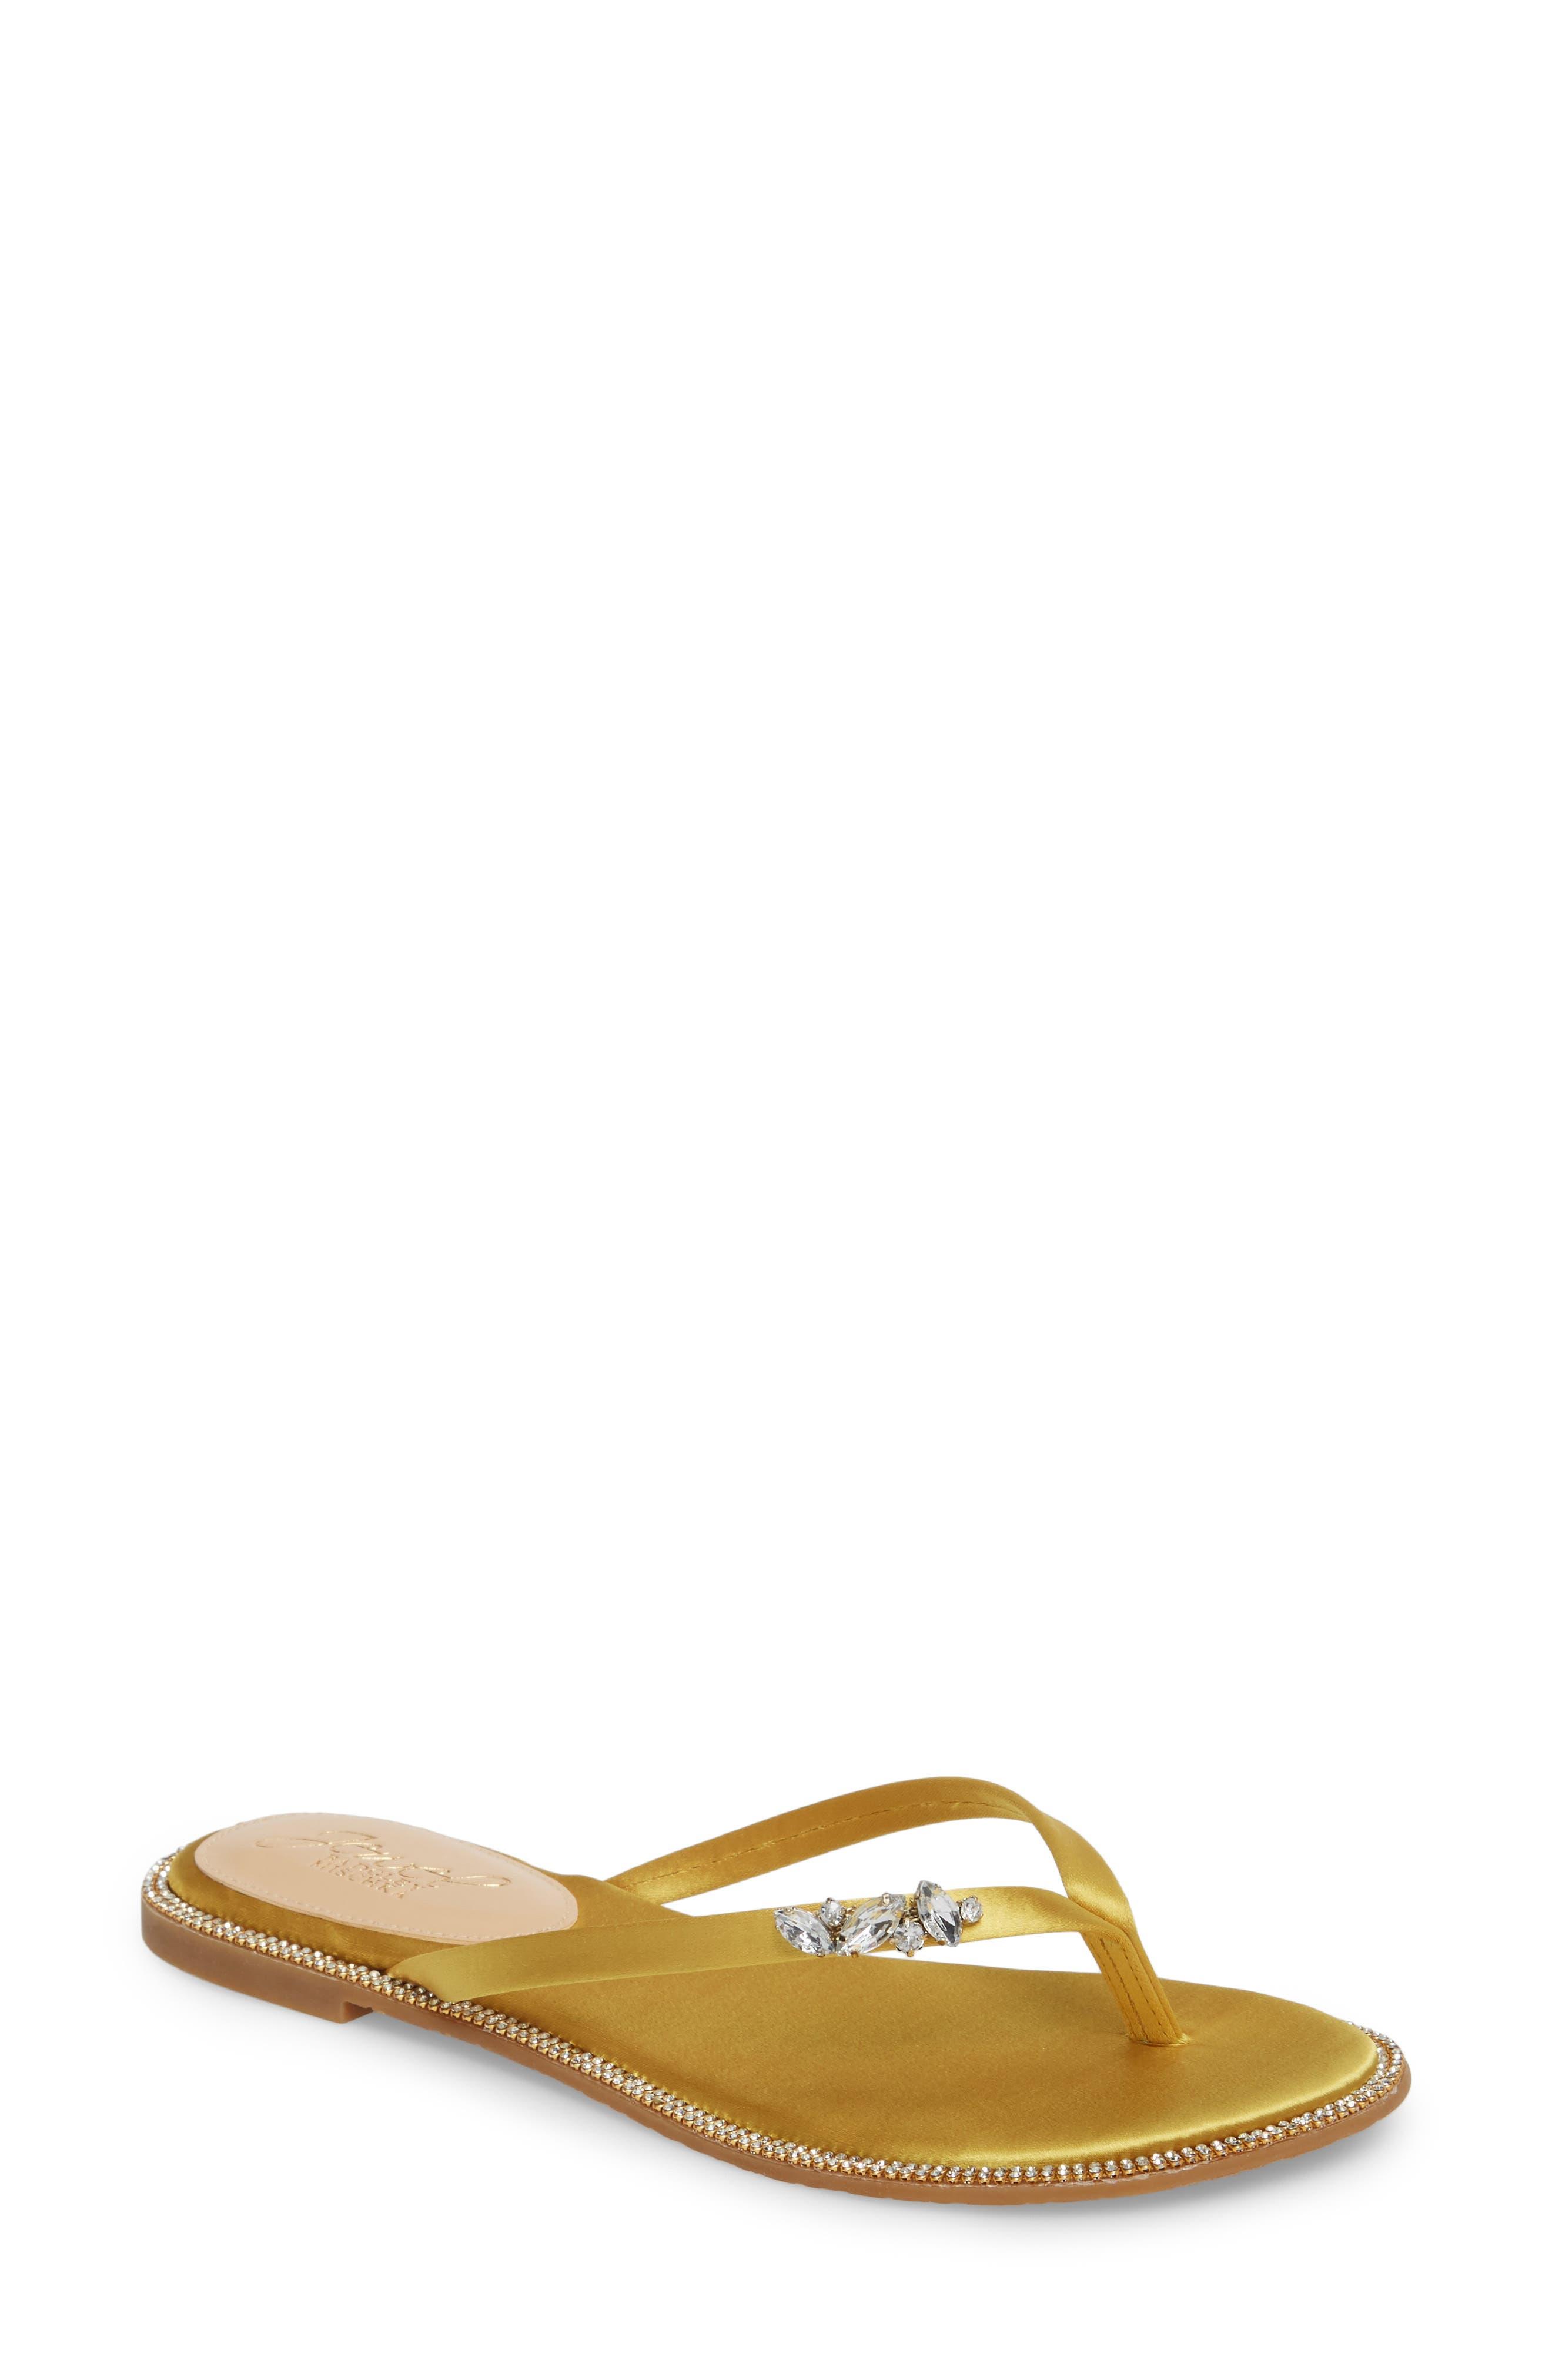 Thalia Crystal Embellished Flip Flop,                         Main,                         color, Yellow Satin